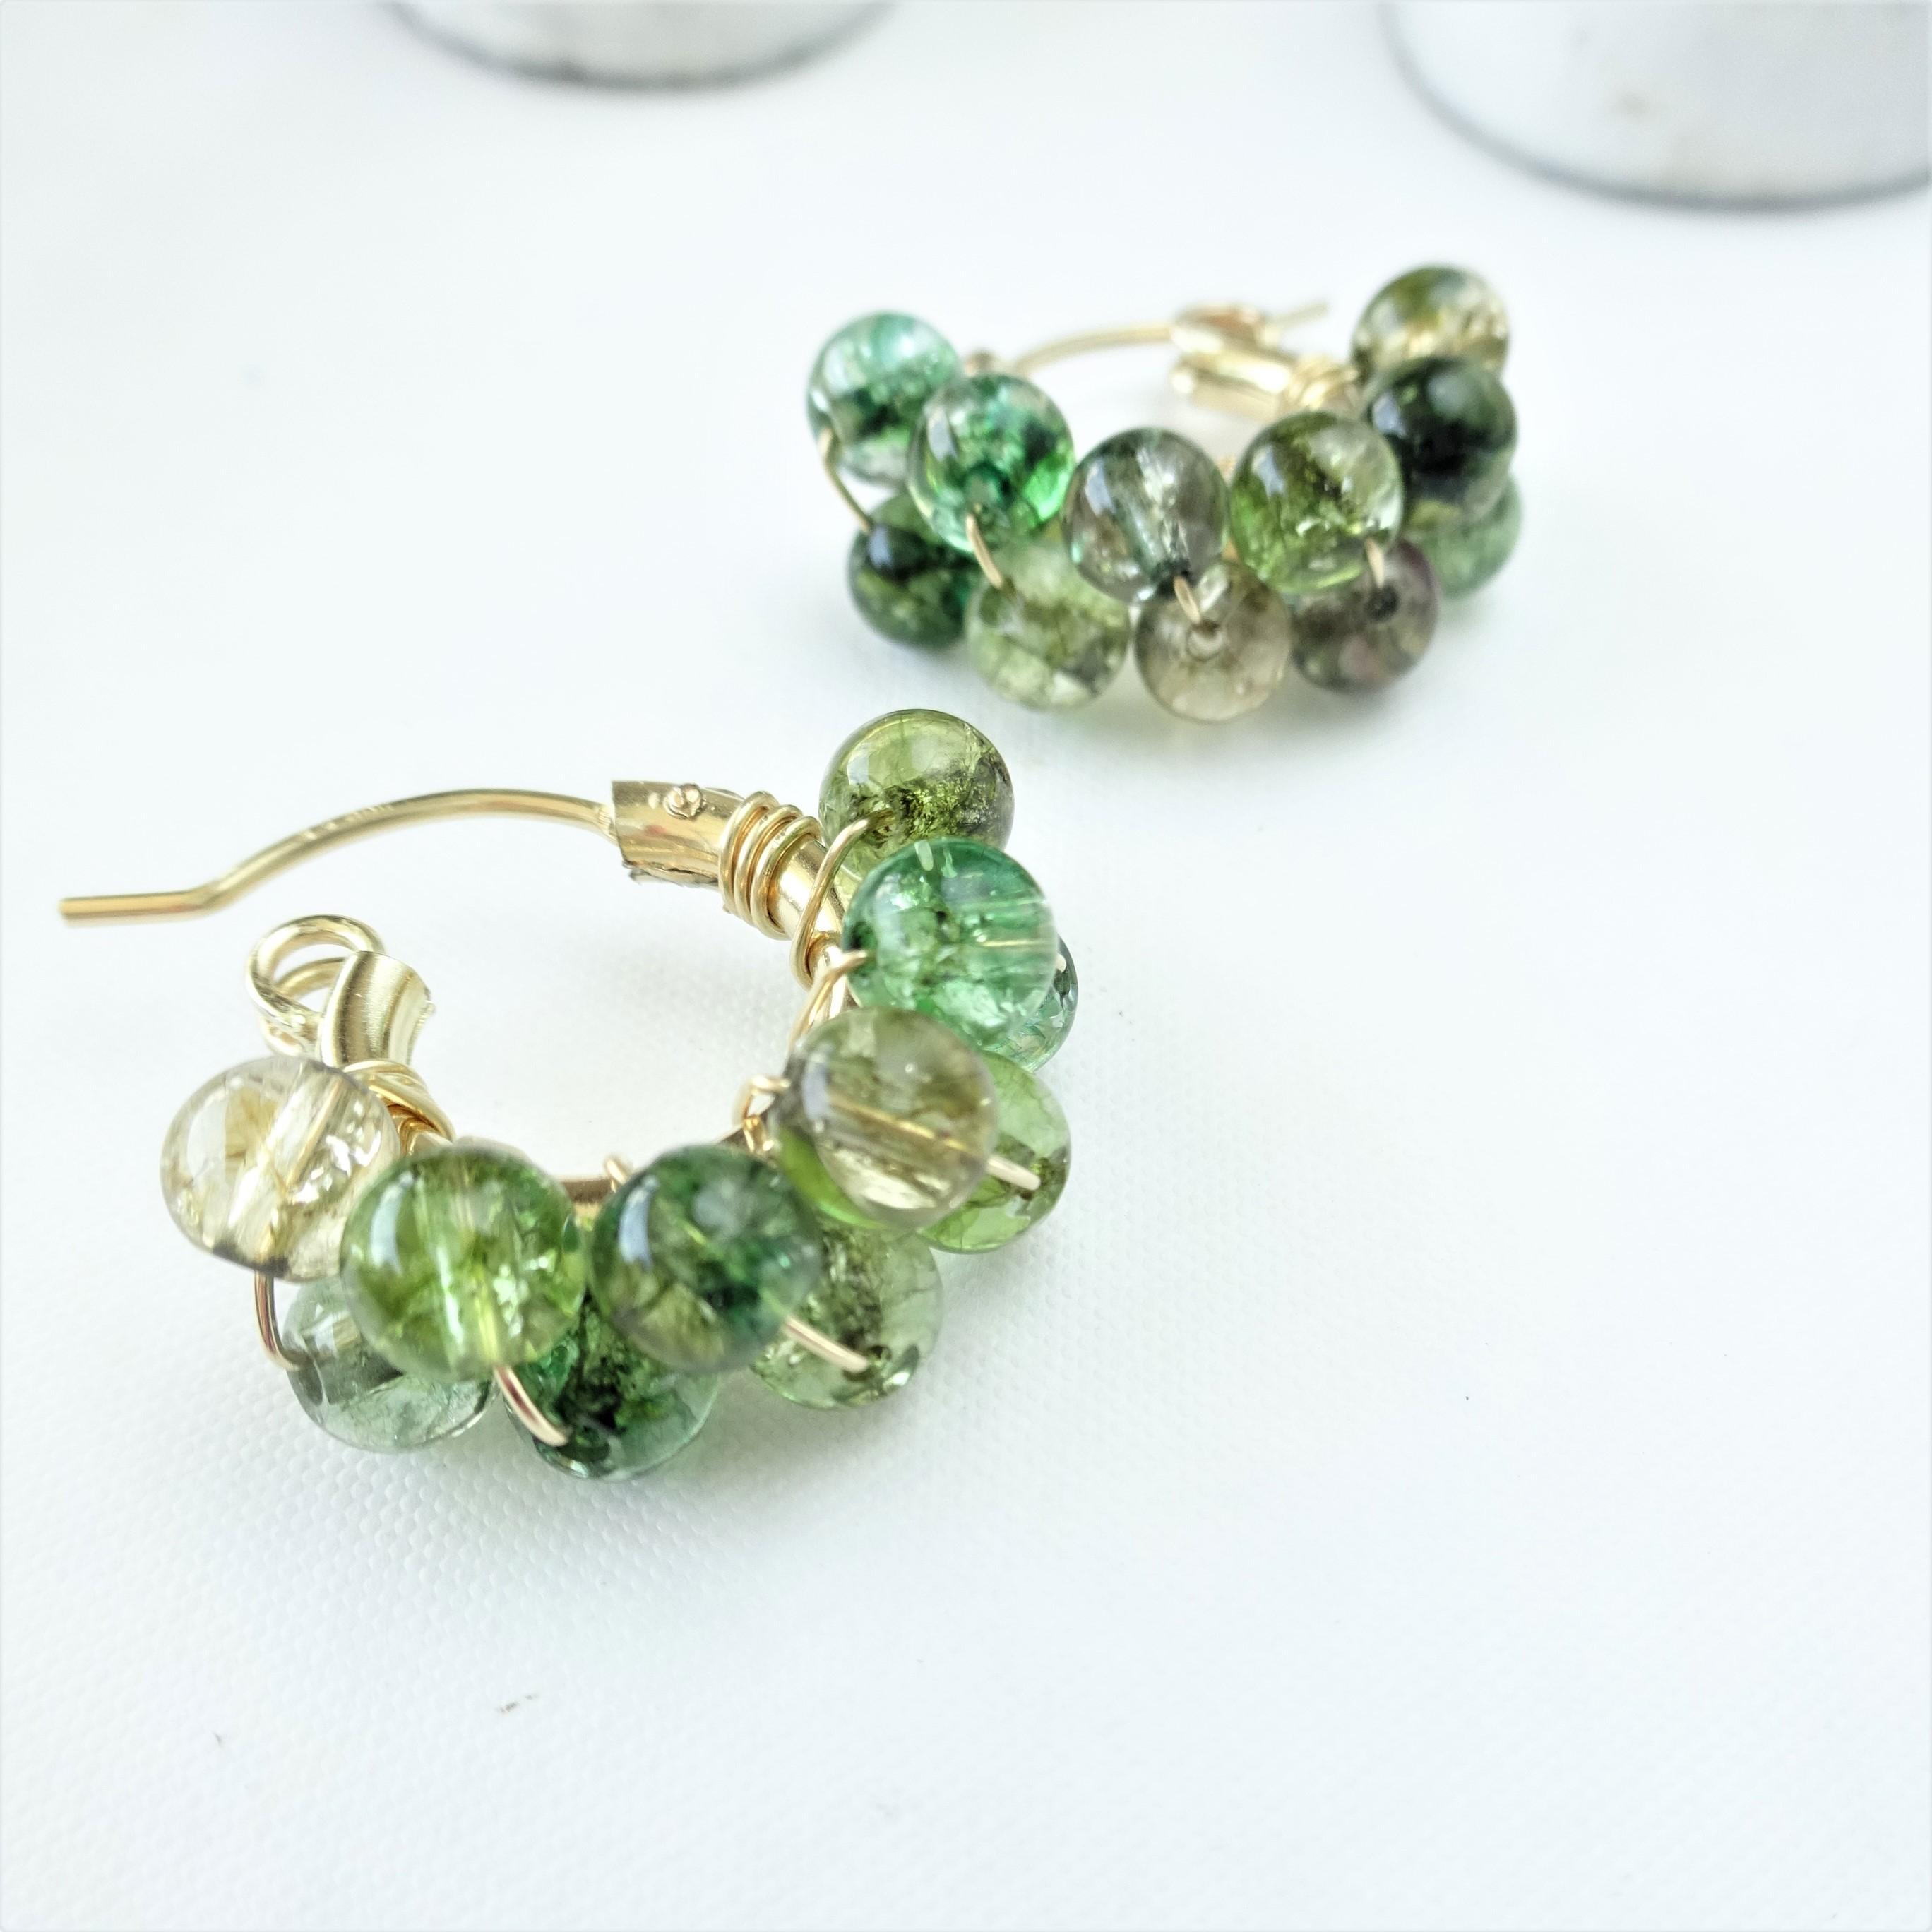 14kgf♡Spring Jerry multicolored quartz pierce/earring GR